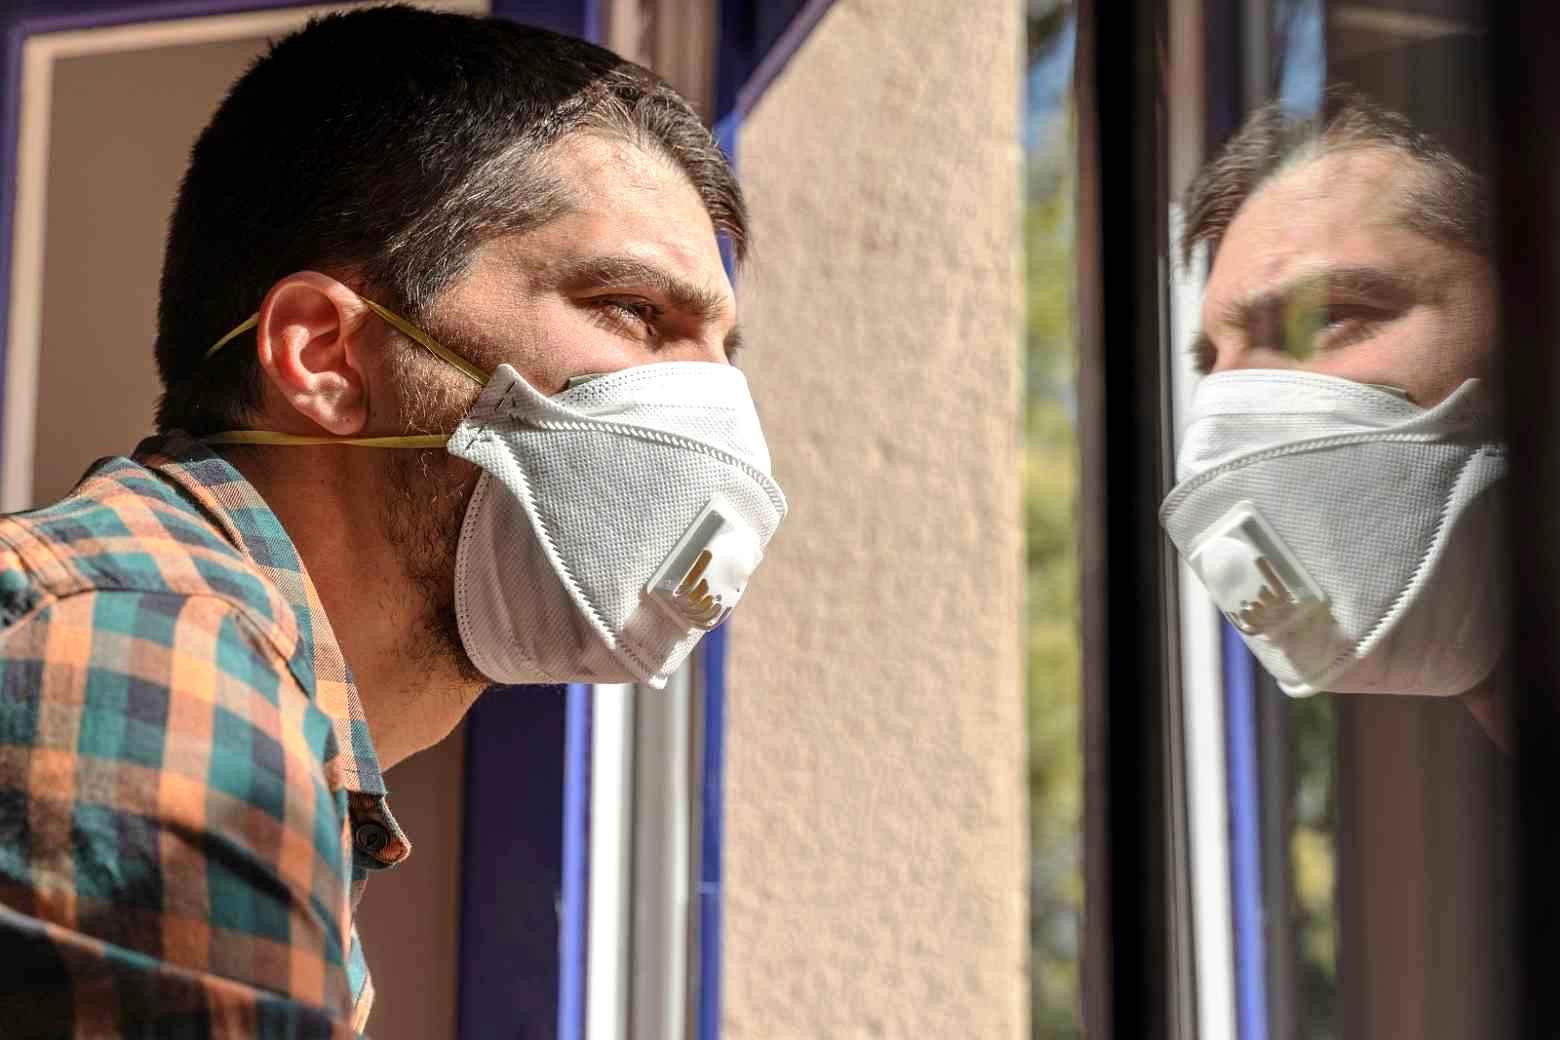 Kdy už bude koronaviru konec? Co vám odborníci zatím neprozradili.